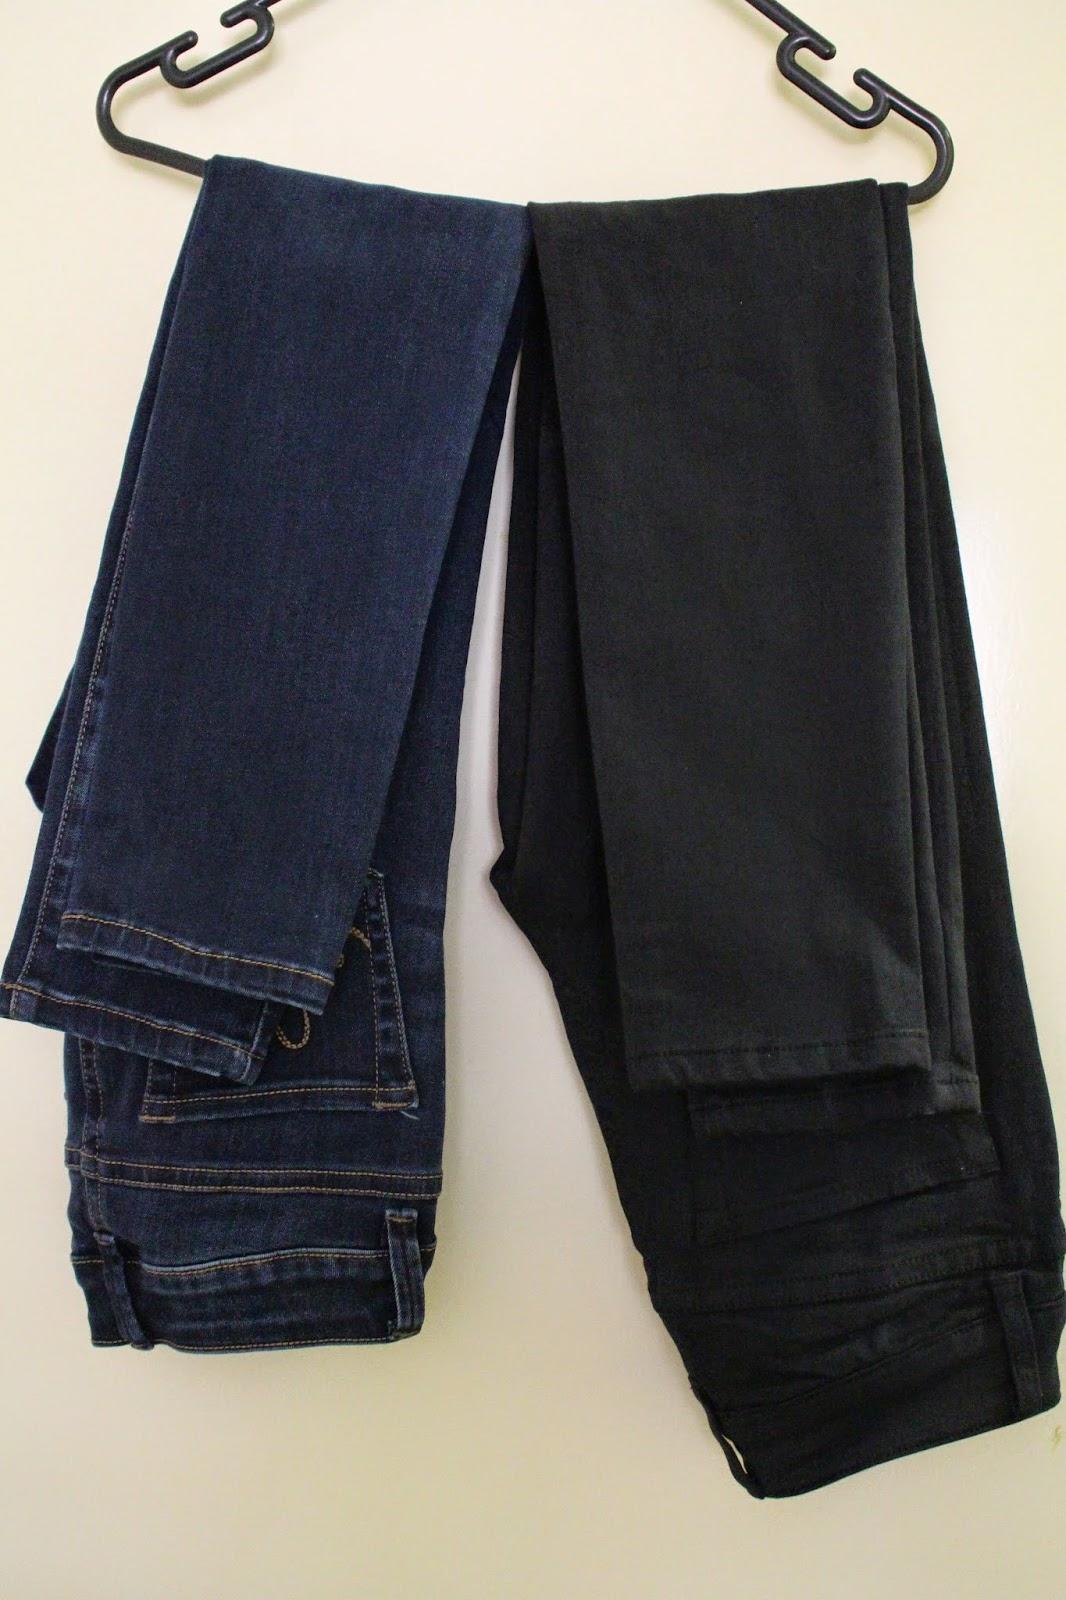 autumn fashion haul, fall fashion haul, jeans, high waisted jeans